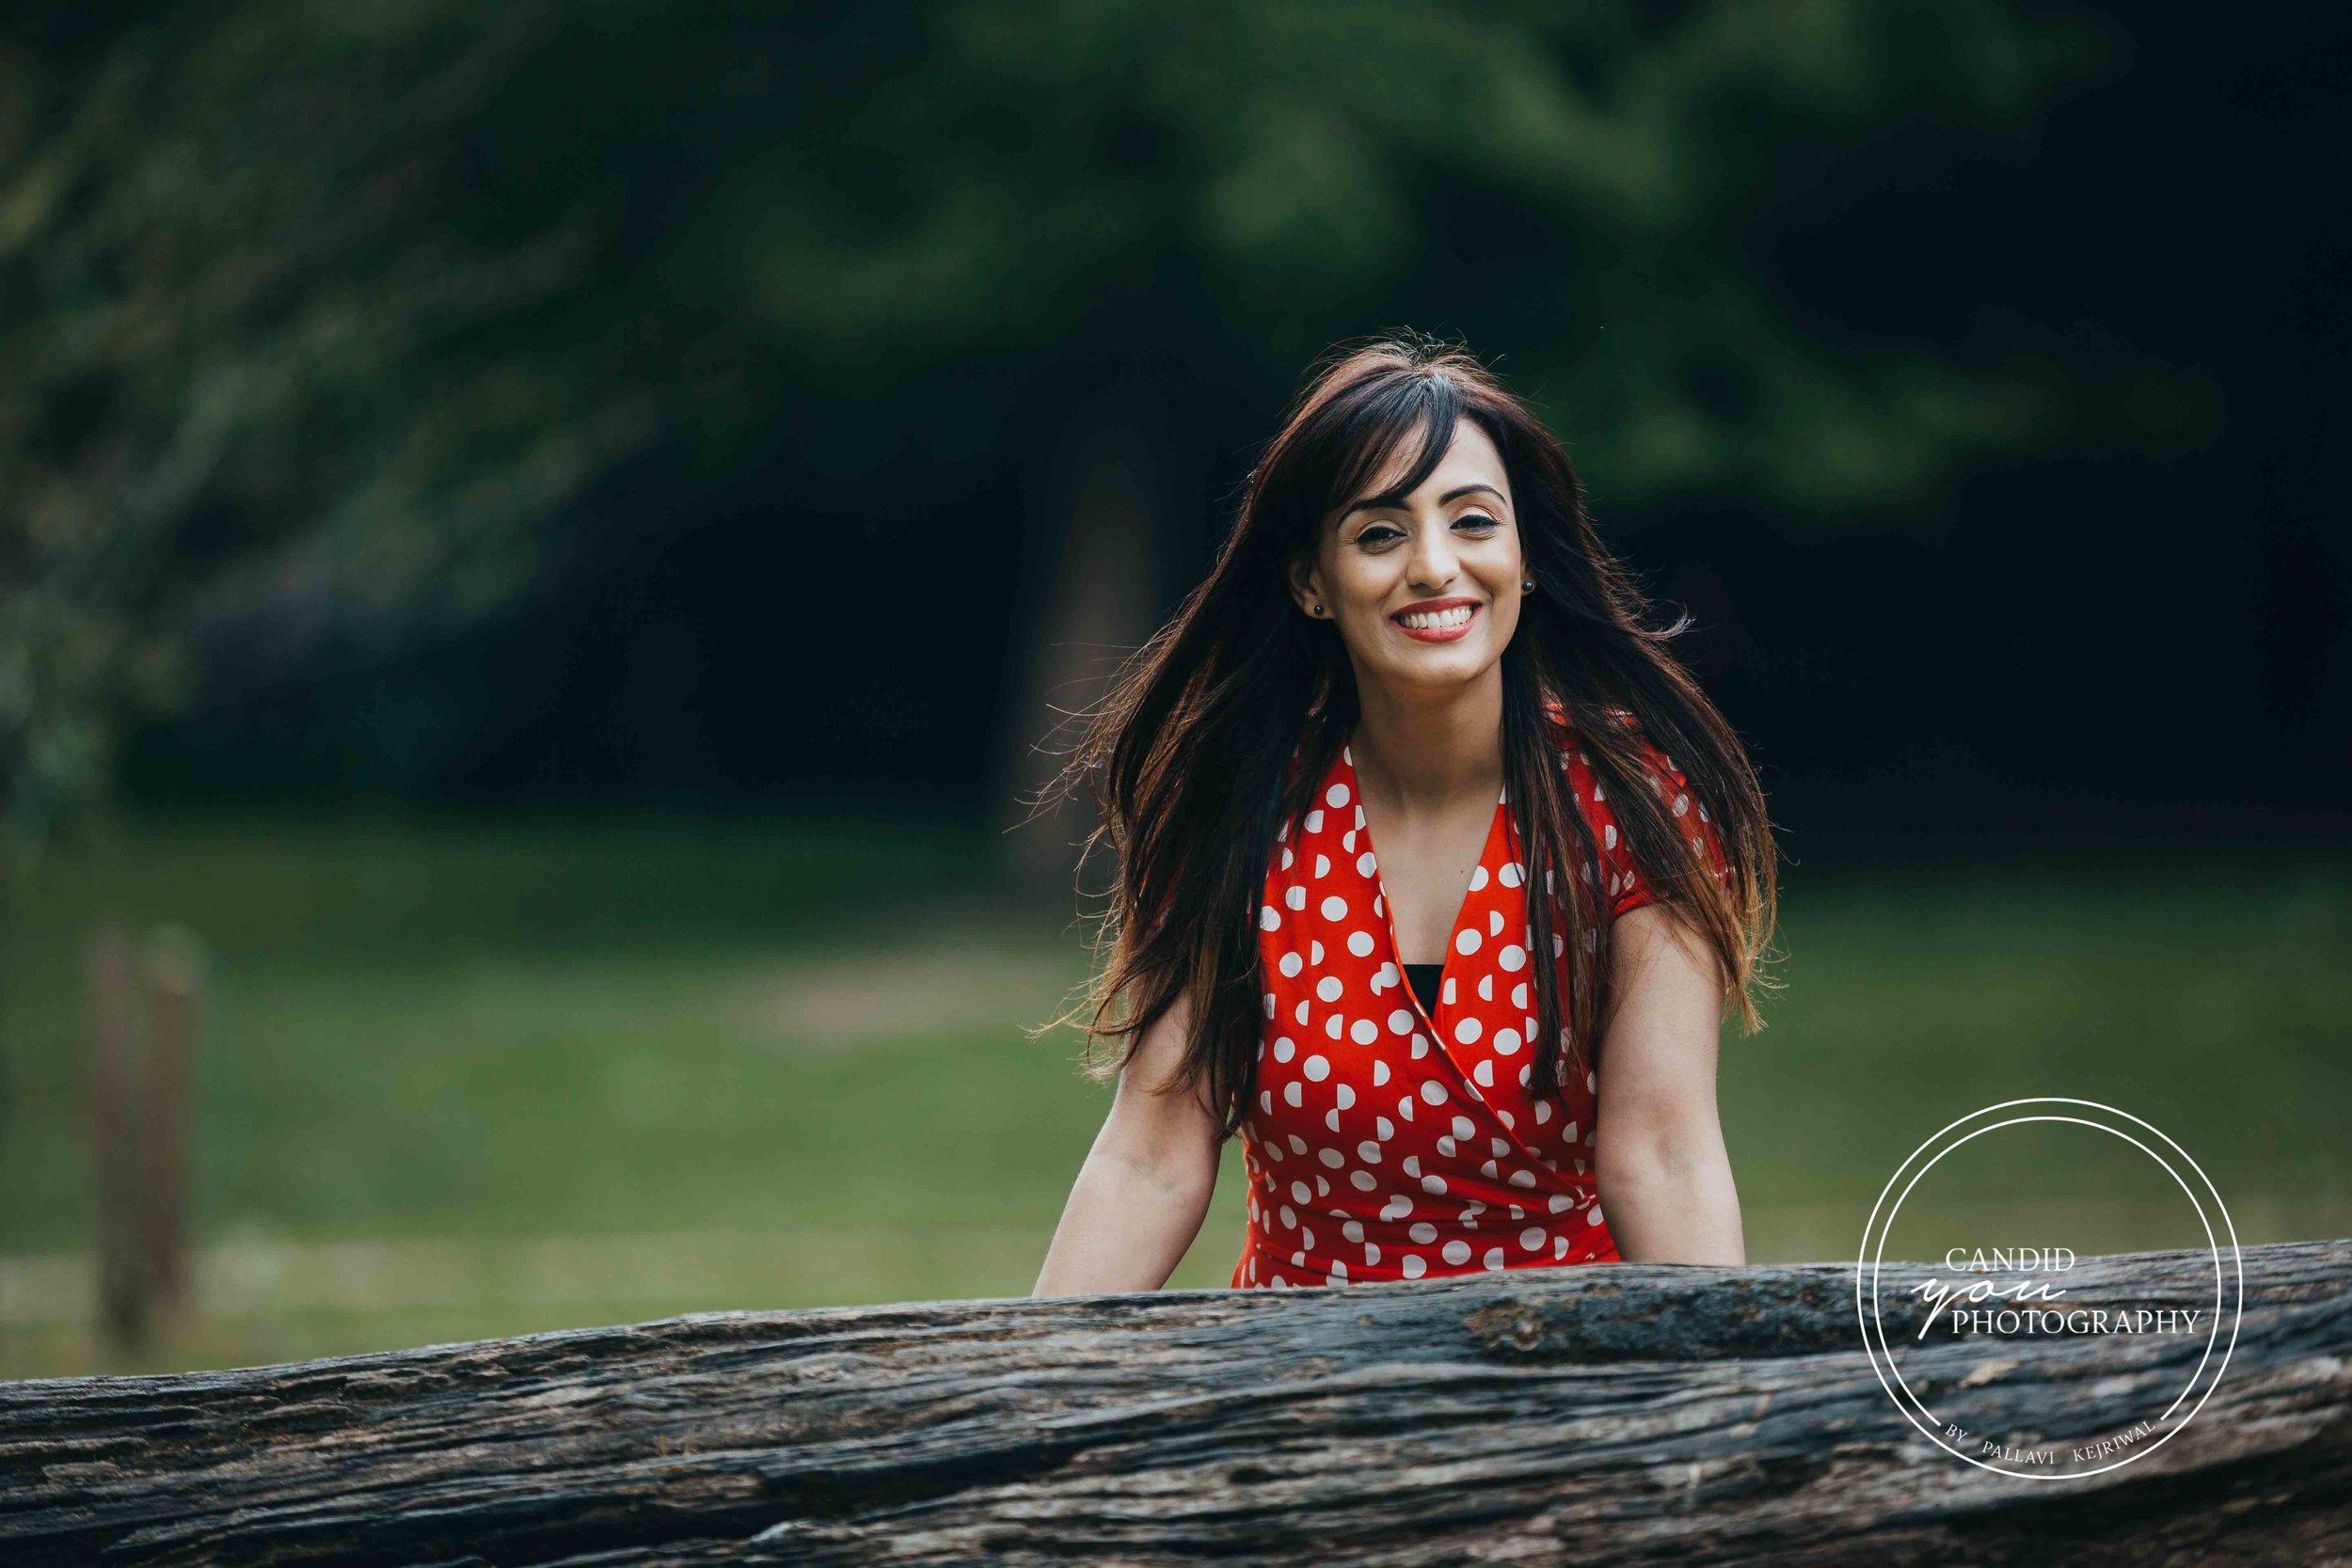 Beautiful lady smiling in orange polka dot dress in park